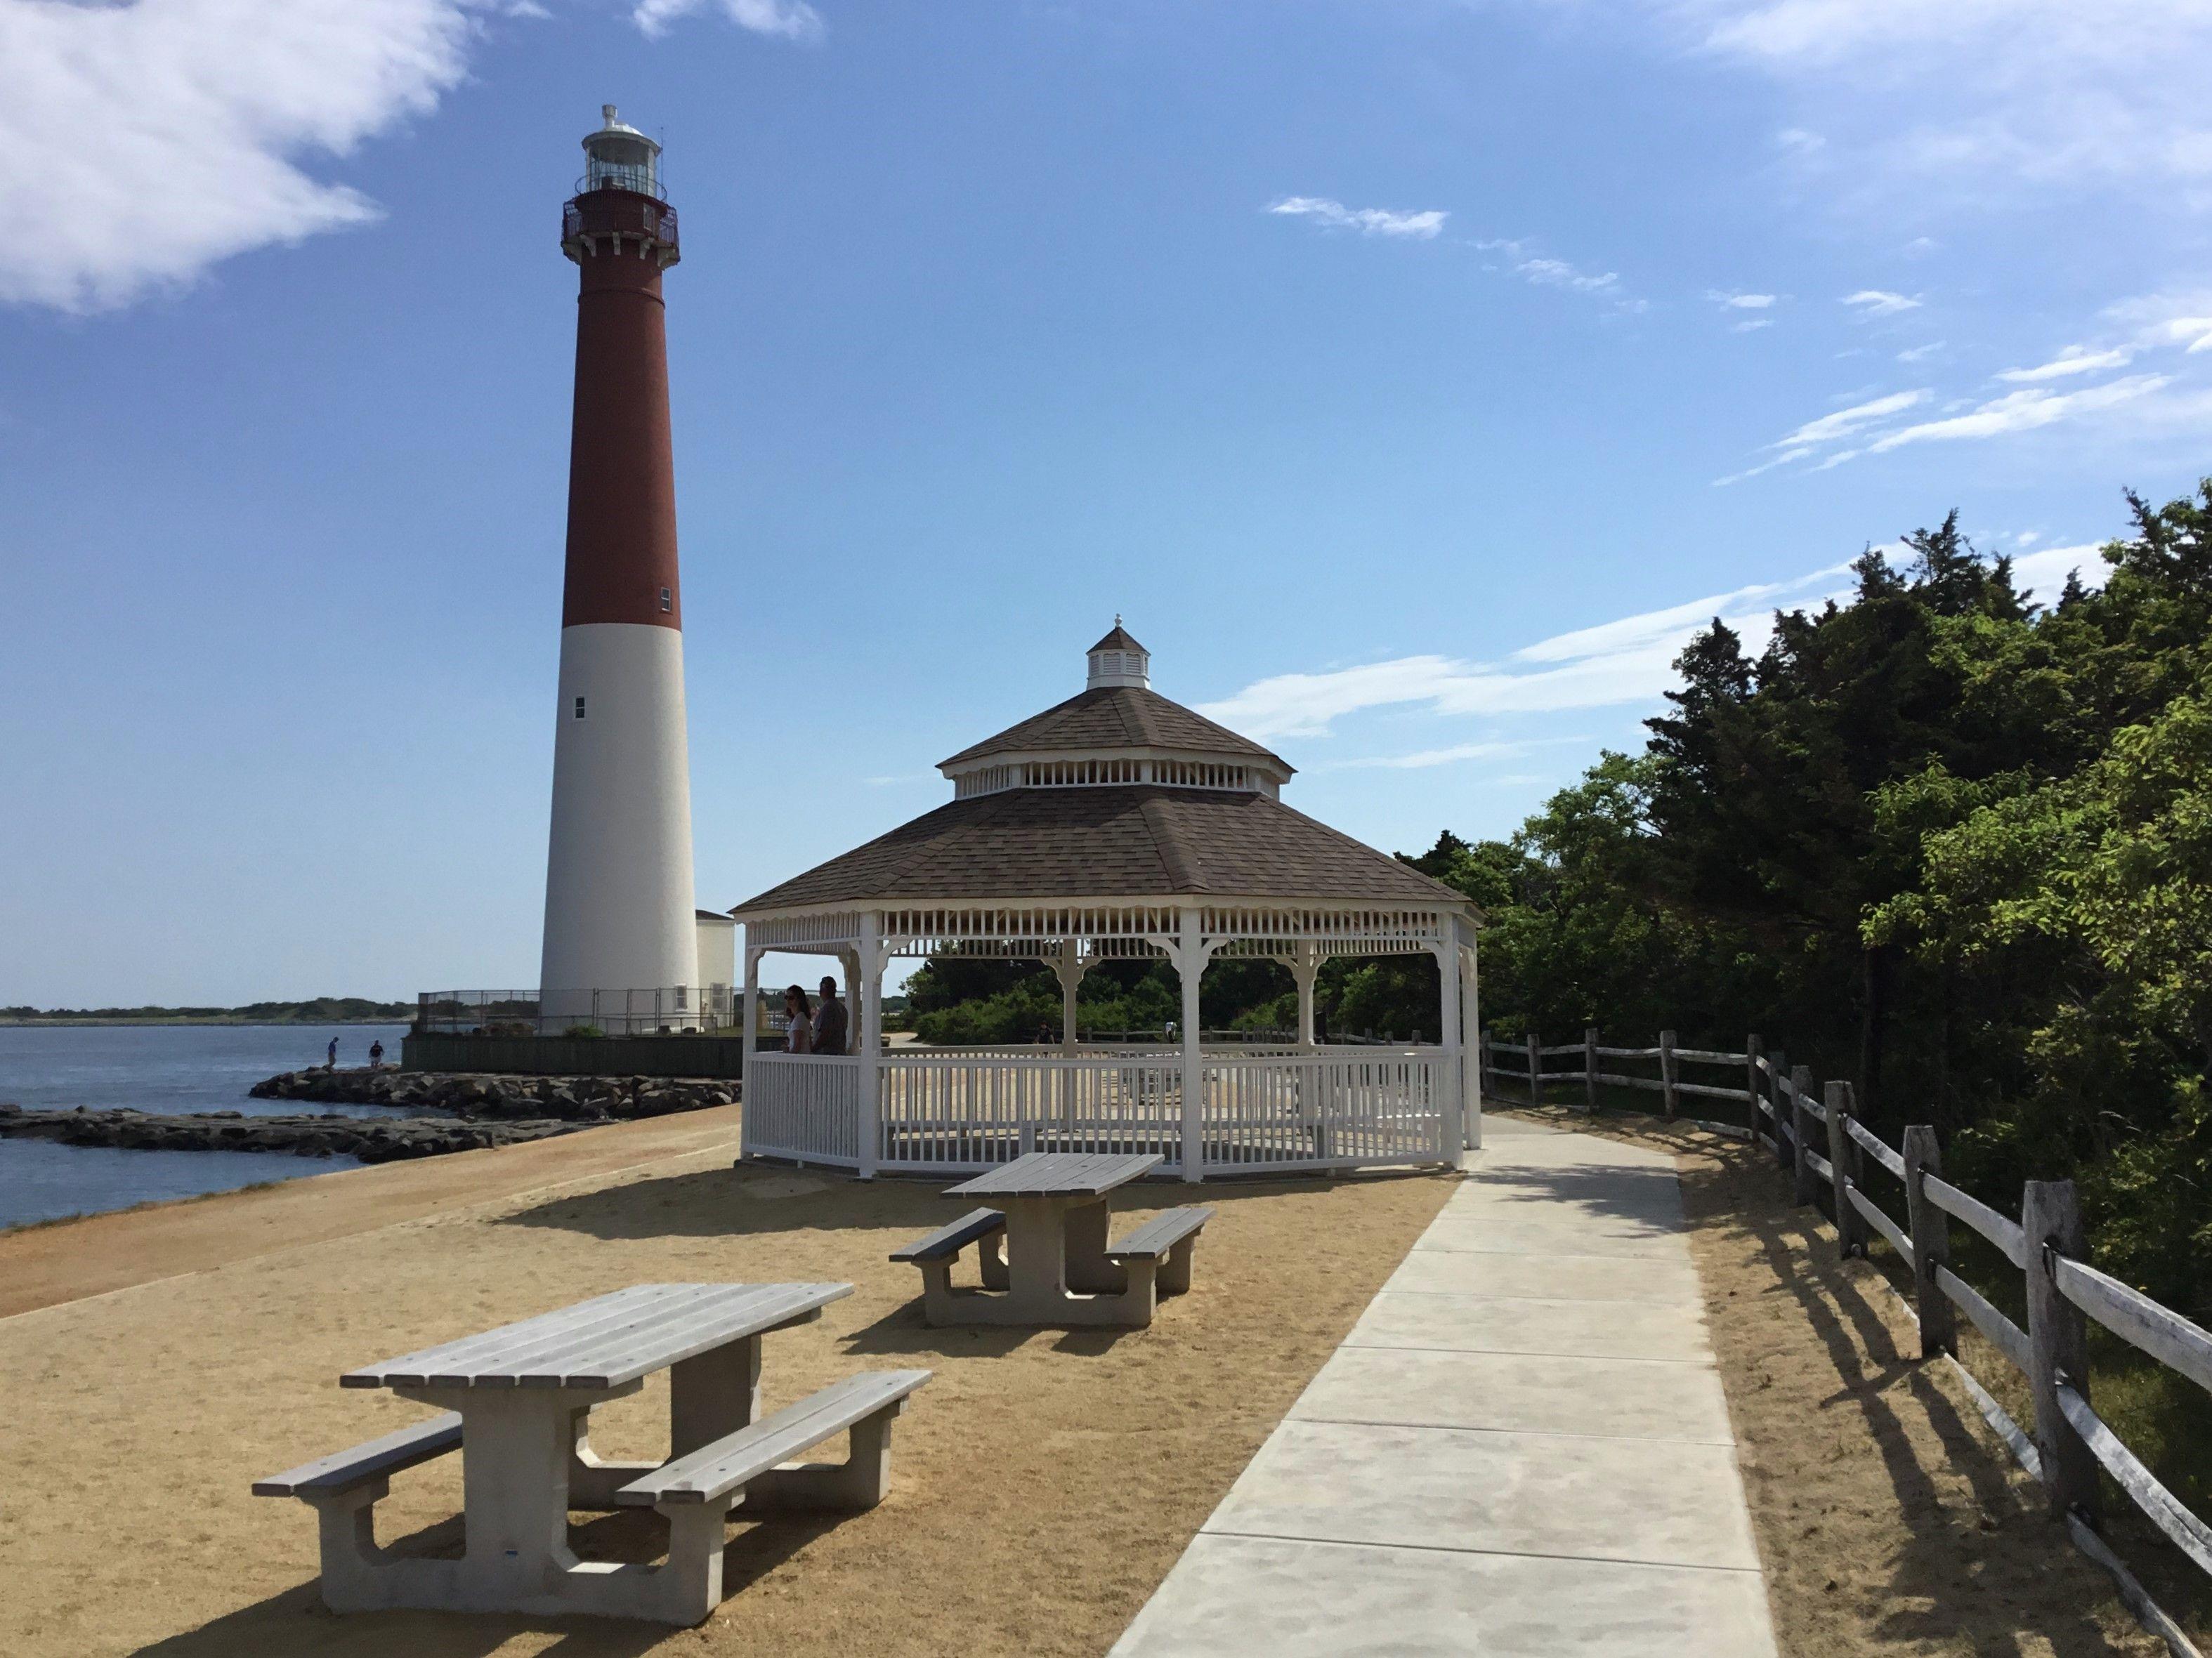 New Pavilion at Barnegat Light NJ in June Perfect backdrop